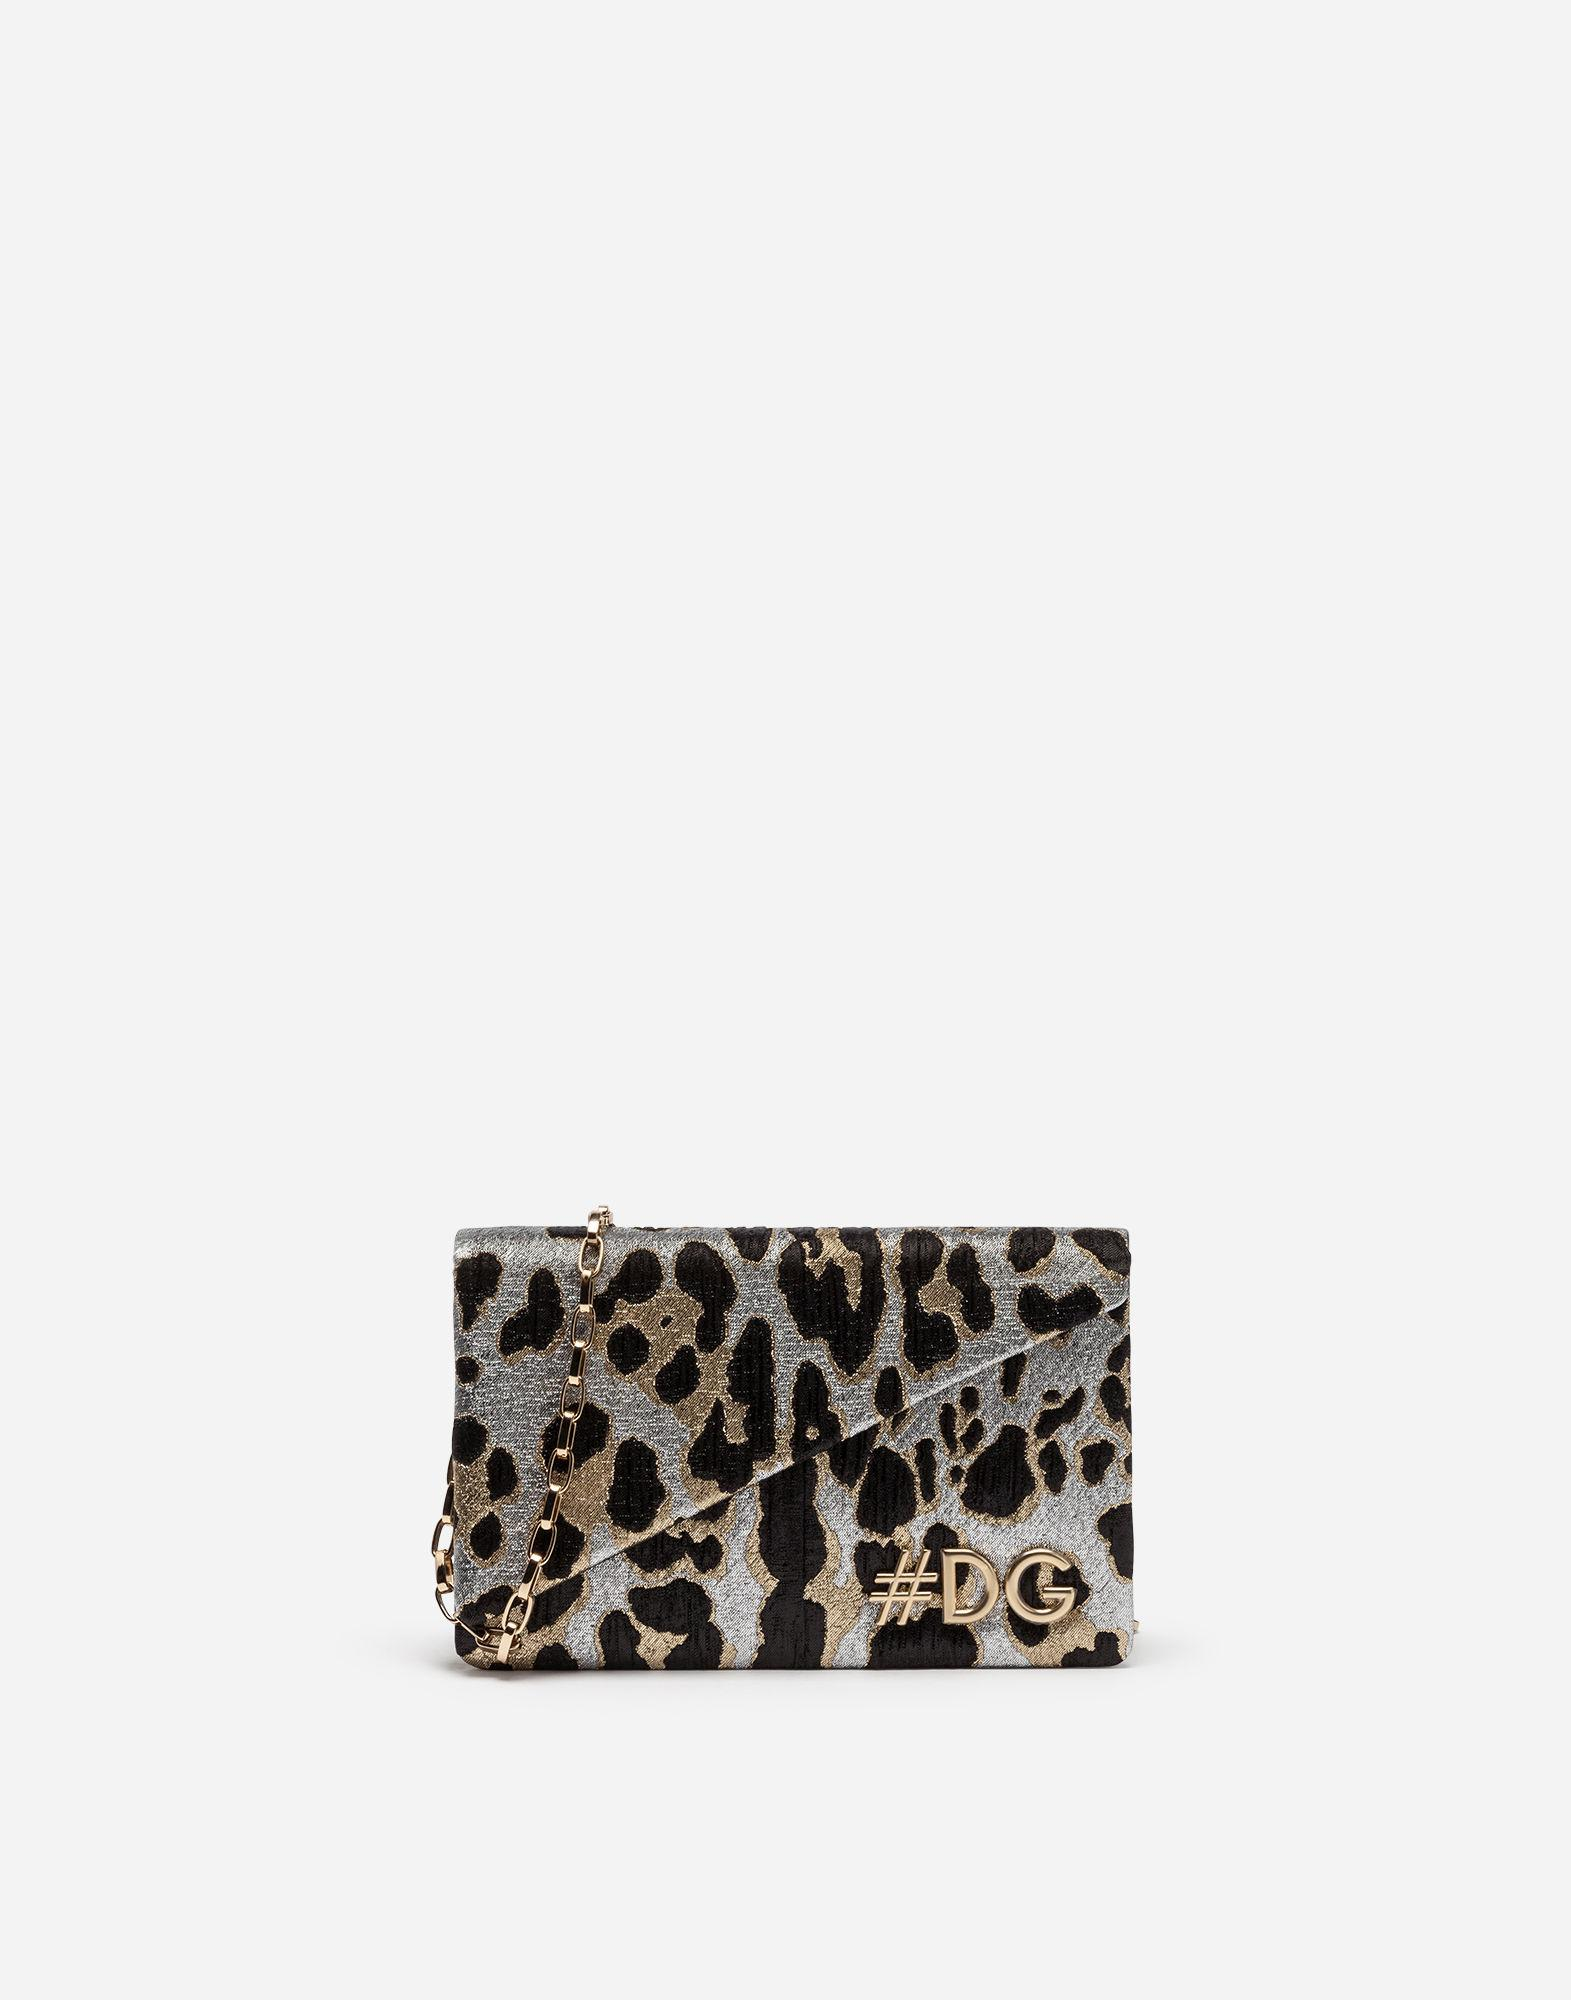 e2a24d09ee Dolce   Gabbana - Multicolor Dg Girls Clutch In Leopard Jacquard - Lyst